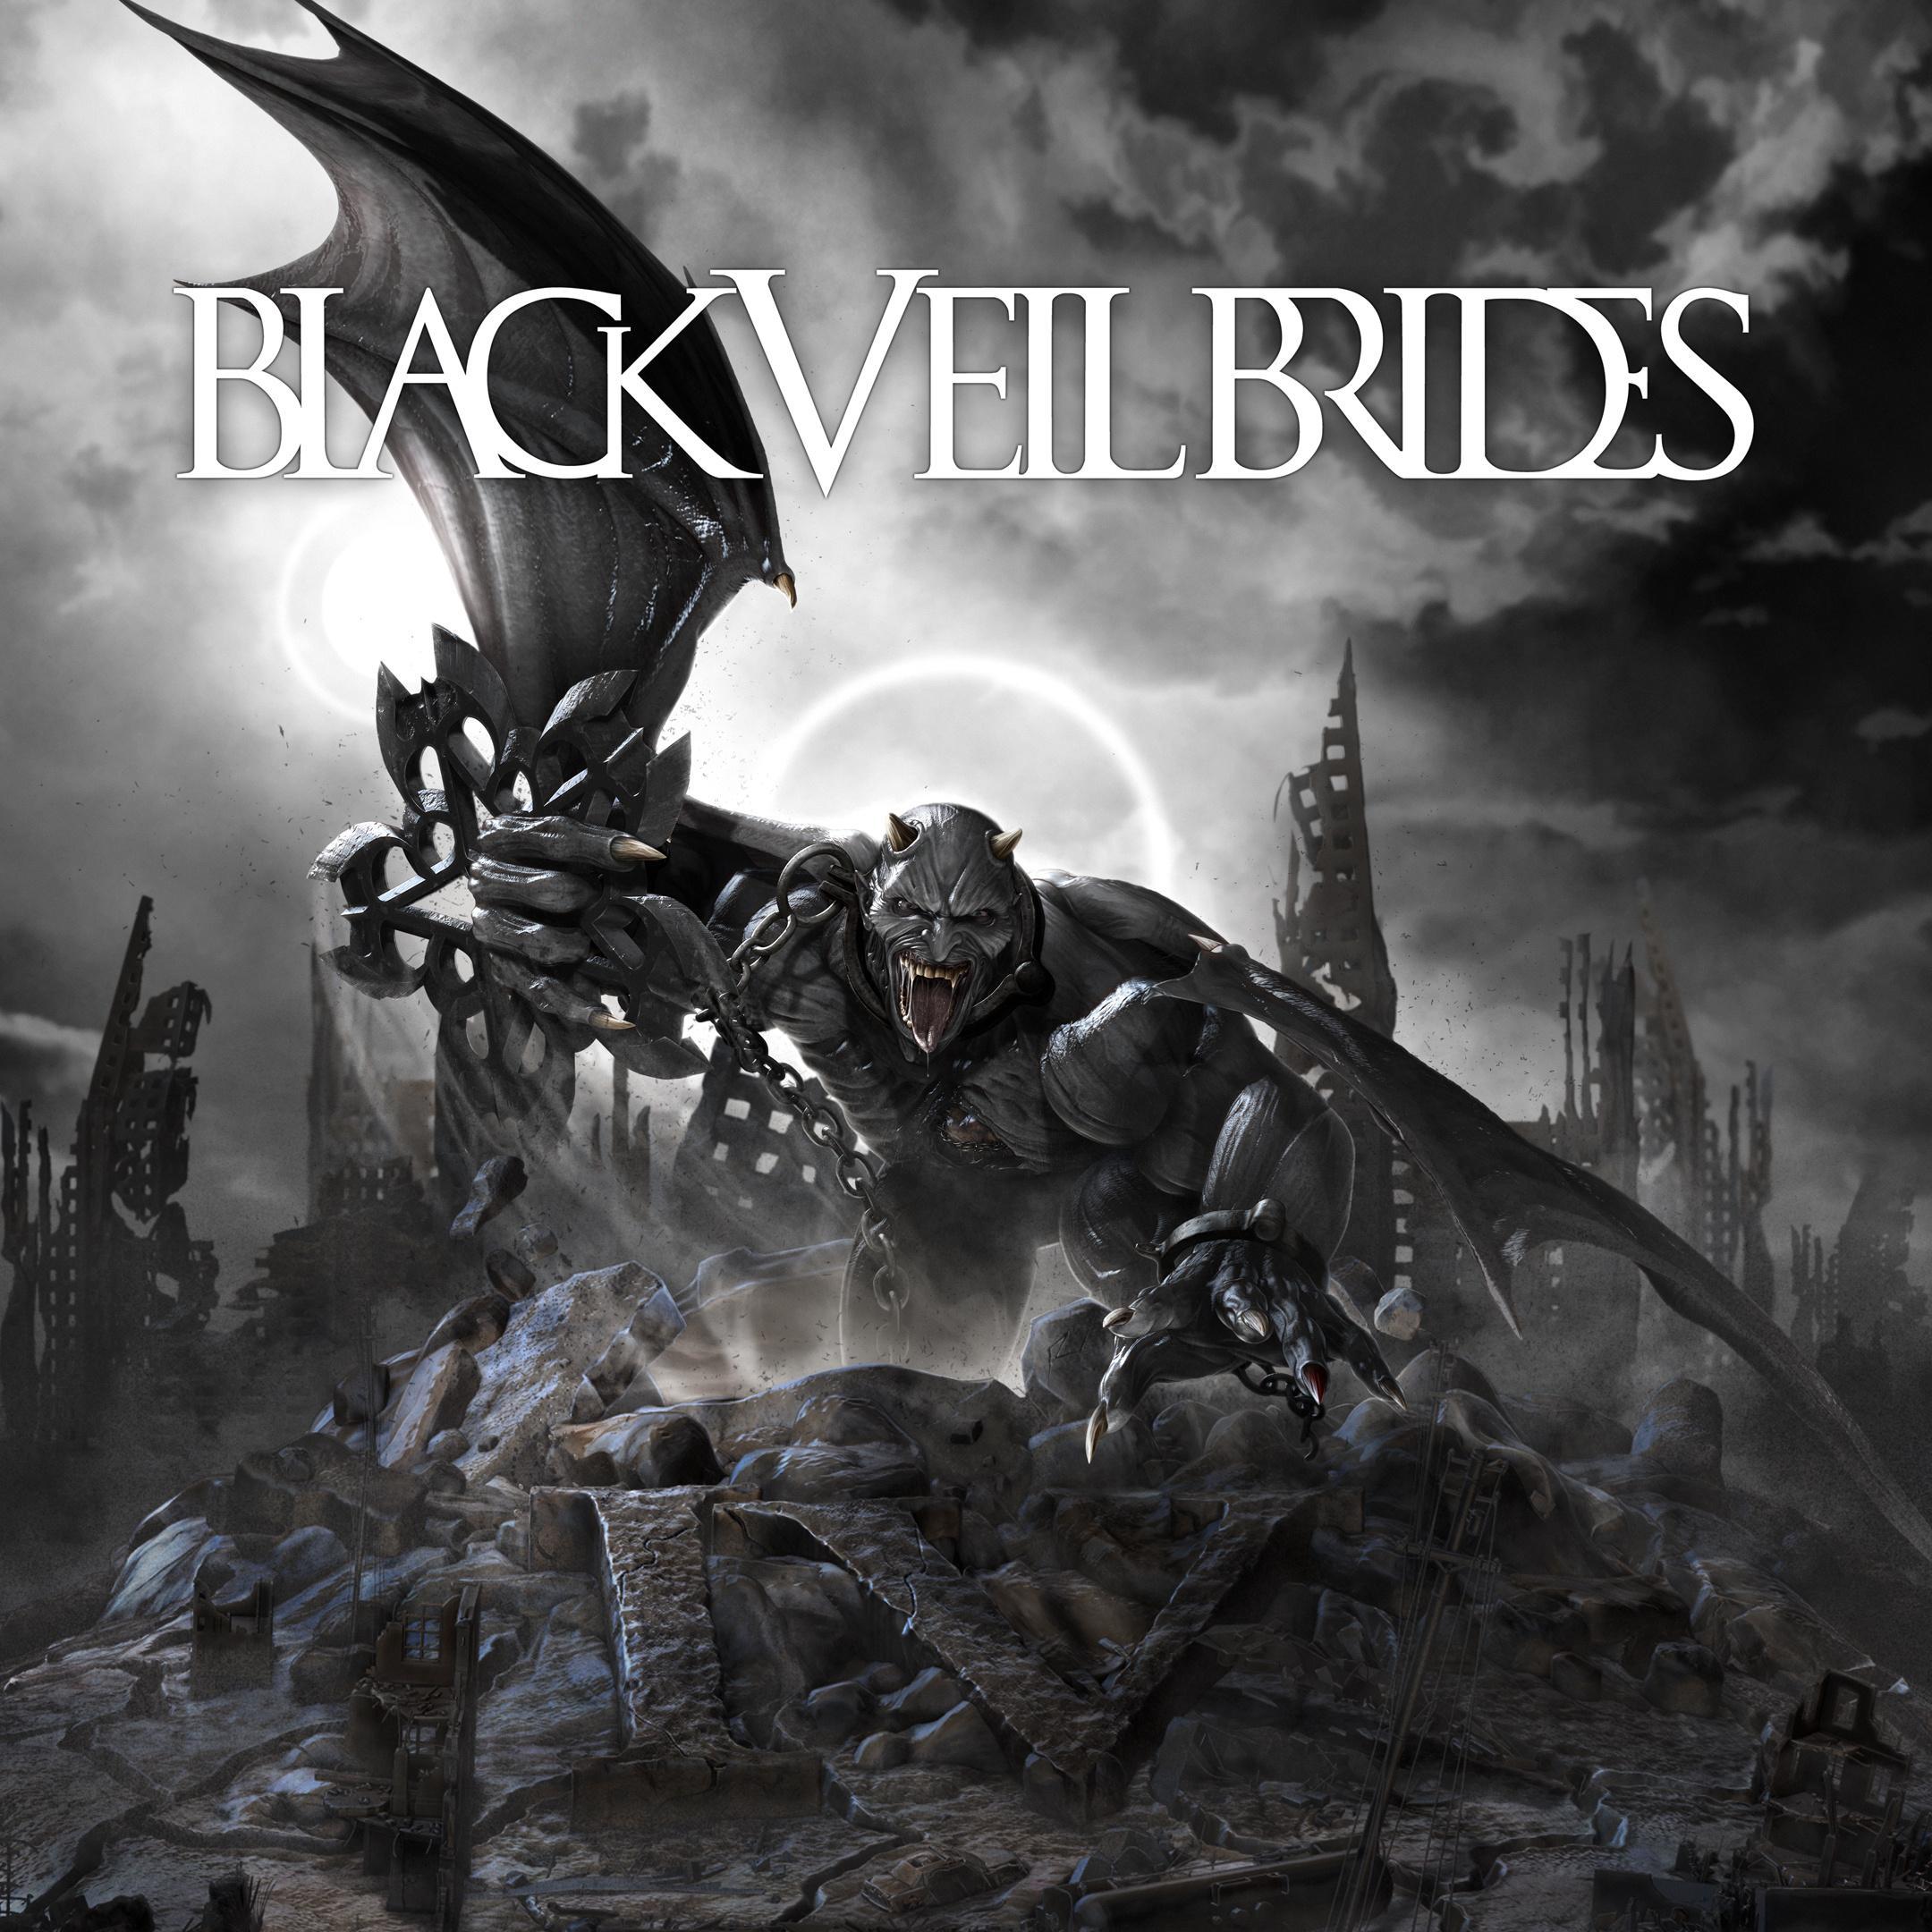 BlackVeilBrides_BlackVeilBrides.jpg